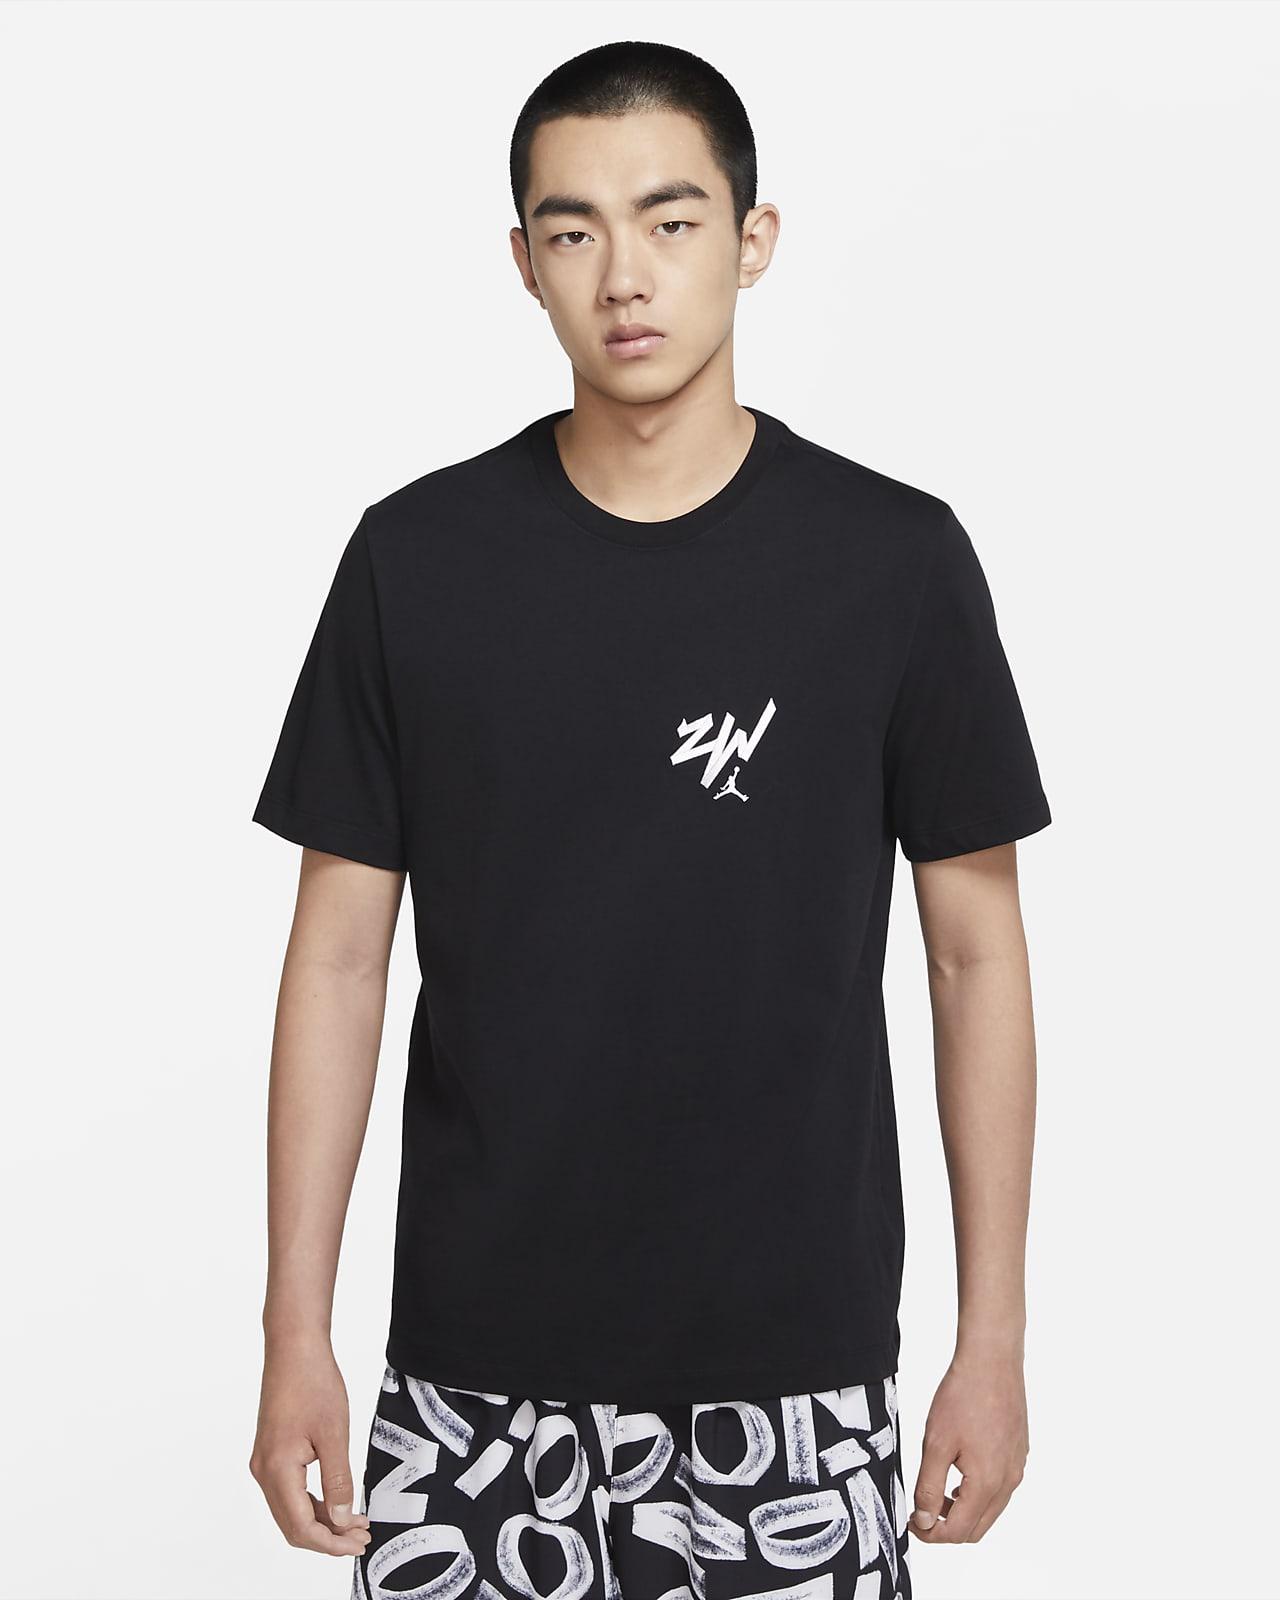 Zion 男子短袖T恤